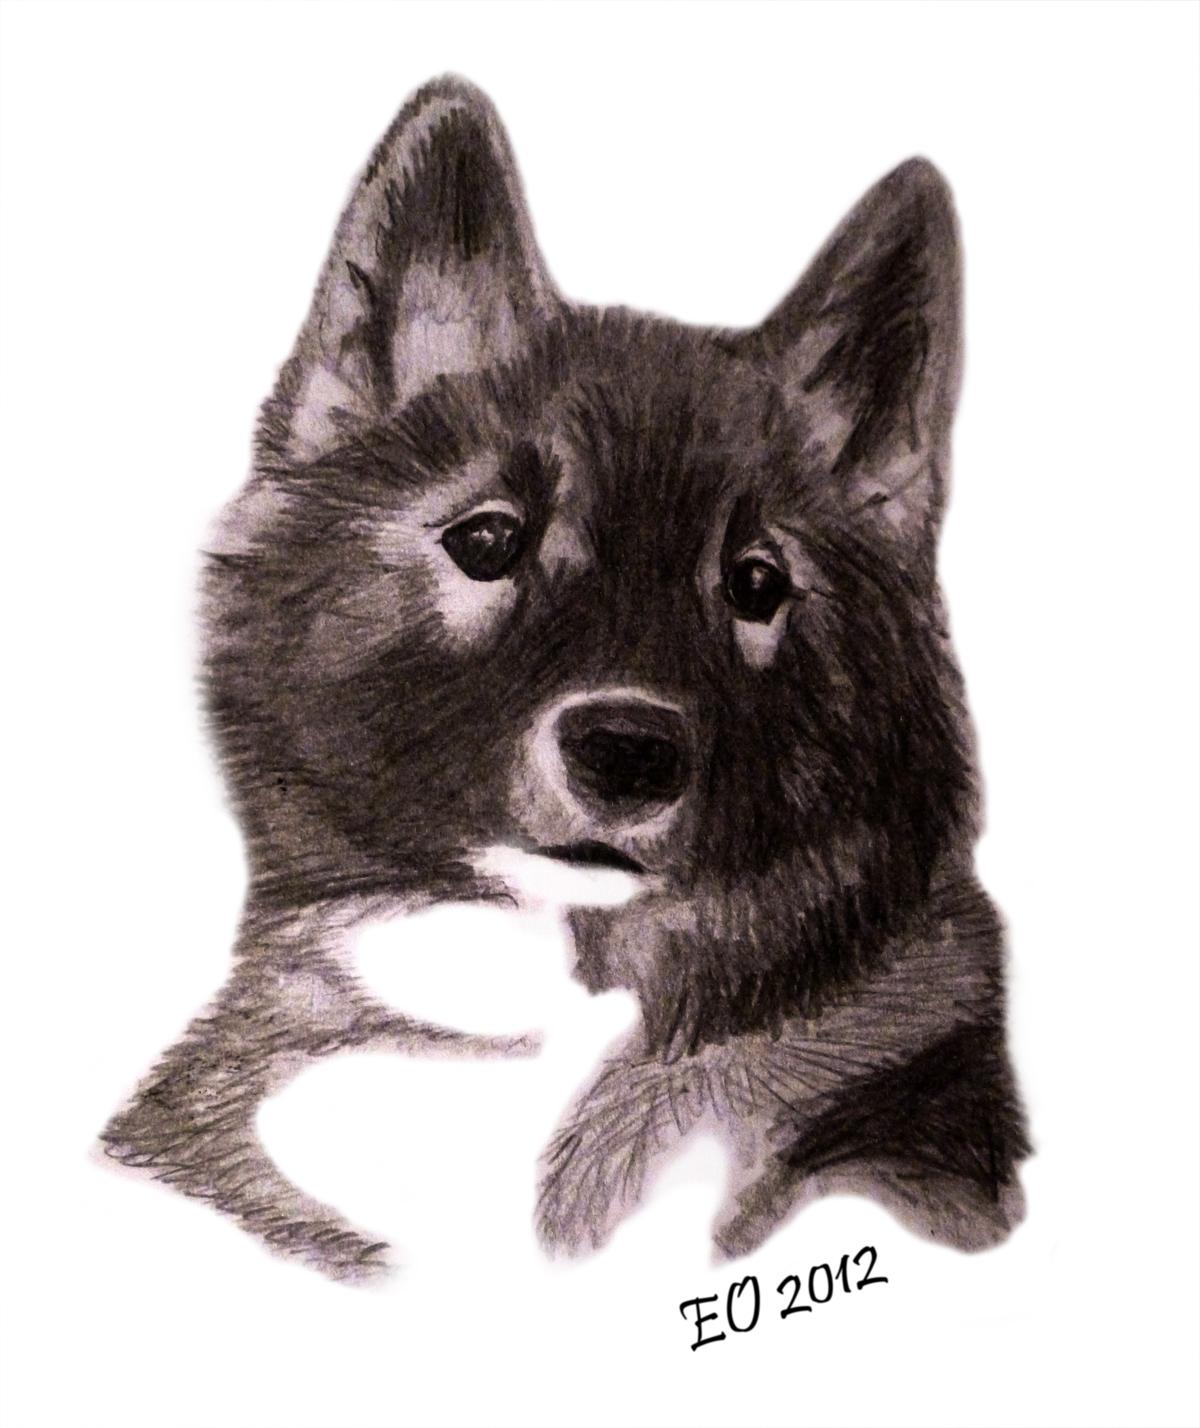 http://3.bp.blogspot.com/-B3MrcJMuFaE/T1Zzx-dYHoI/AAAAAAAABQ8/eXYJR_BlOcQ/s1600/ahsoka+drawing.jpg